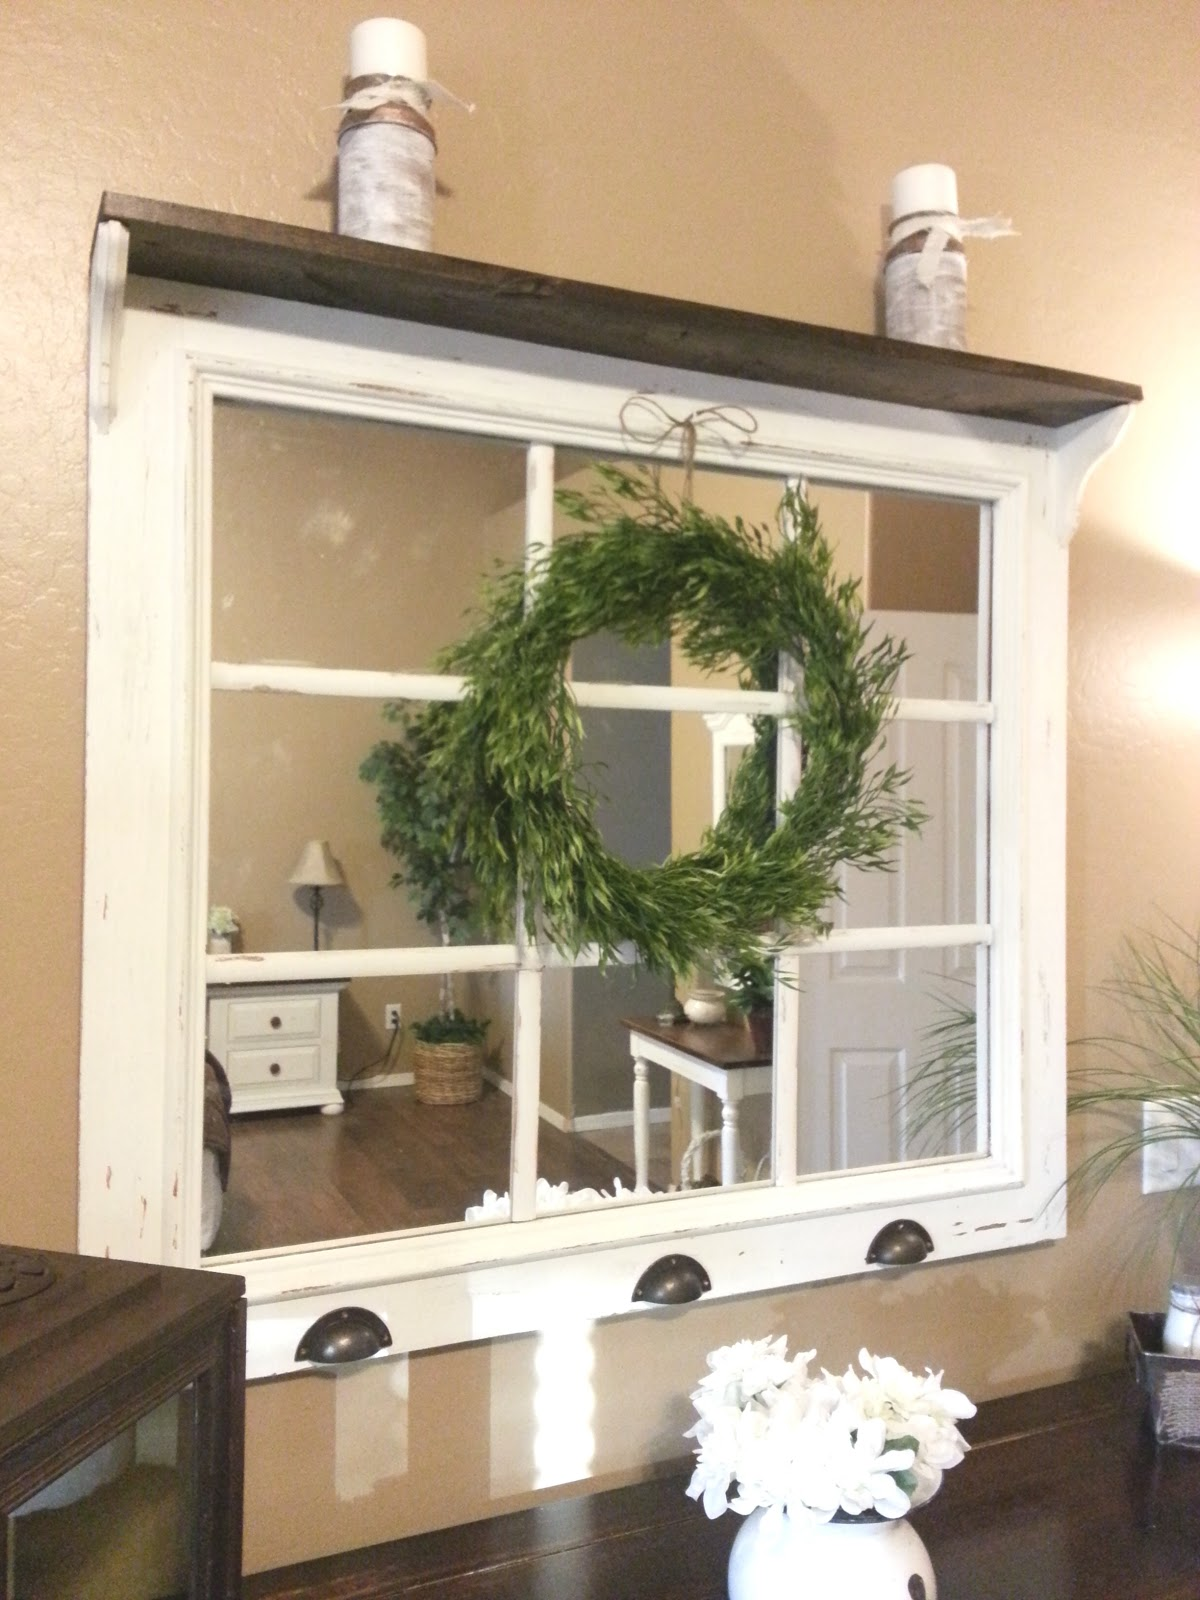 Just Add Some Java Diy Window Pane Mirror